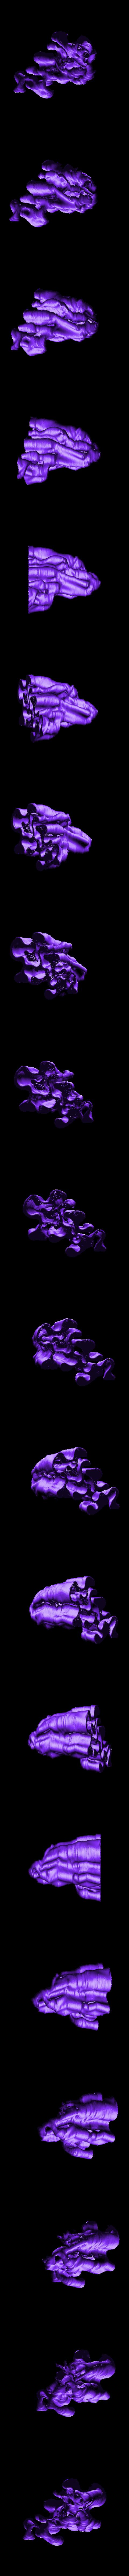 gro4.stl Download free STL file Weird terrain collection • 3D printer object, ferjerez3d